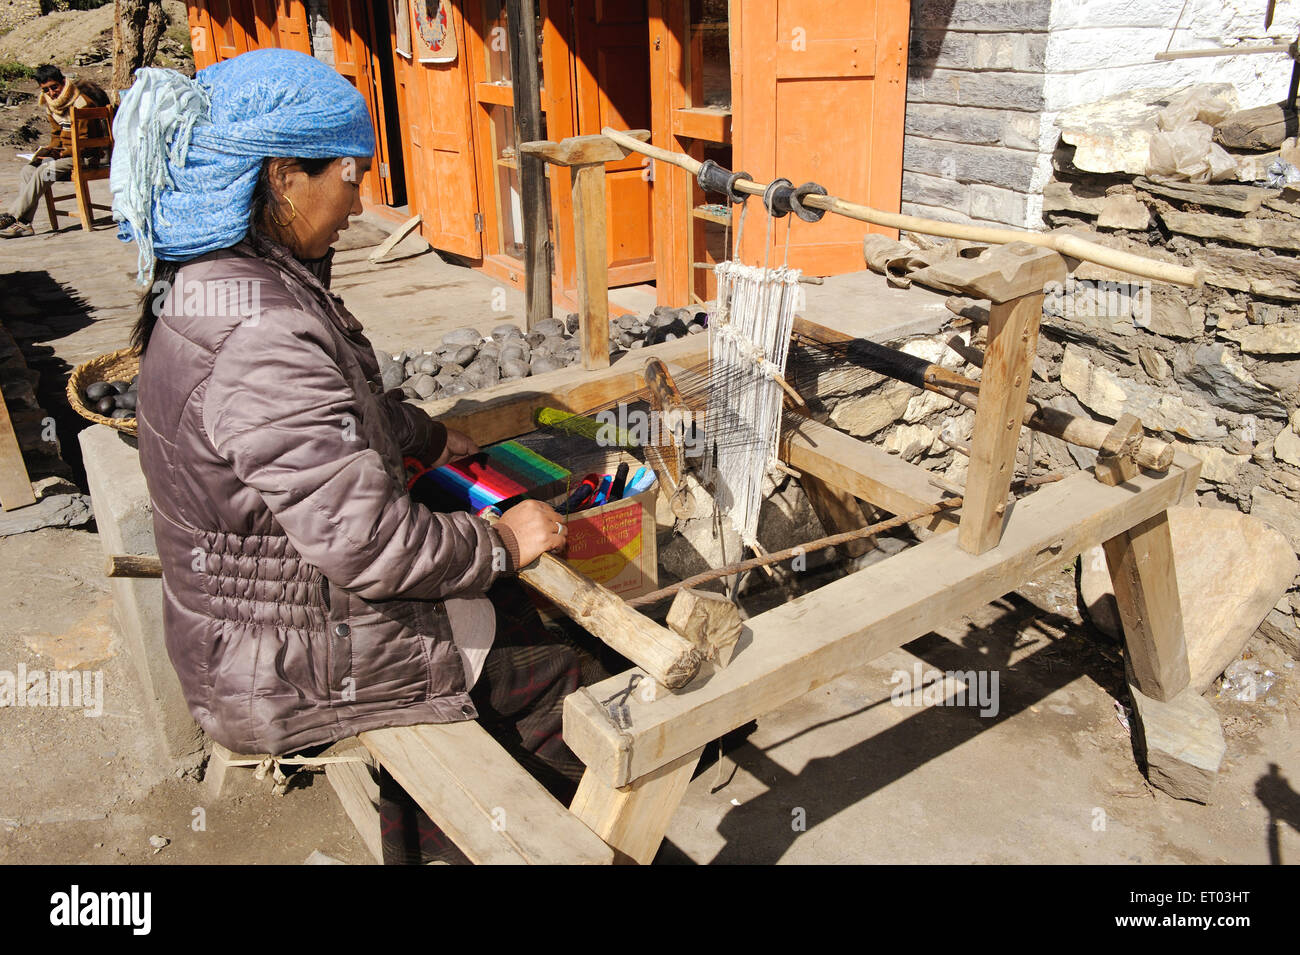 Woman weaving woollen on handloom ; Muktinath ; Nepal NO MR - Stock Image